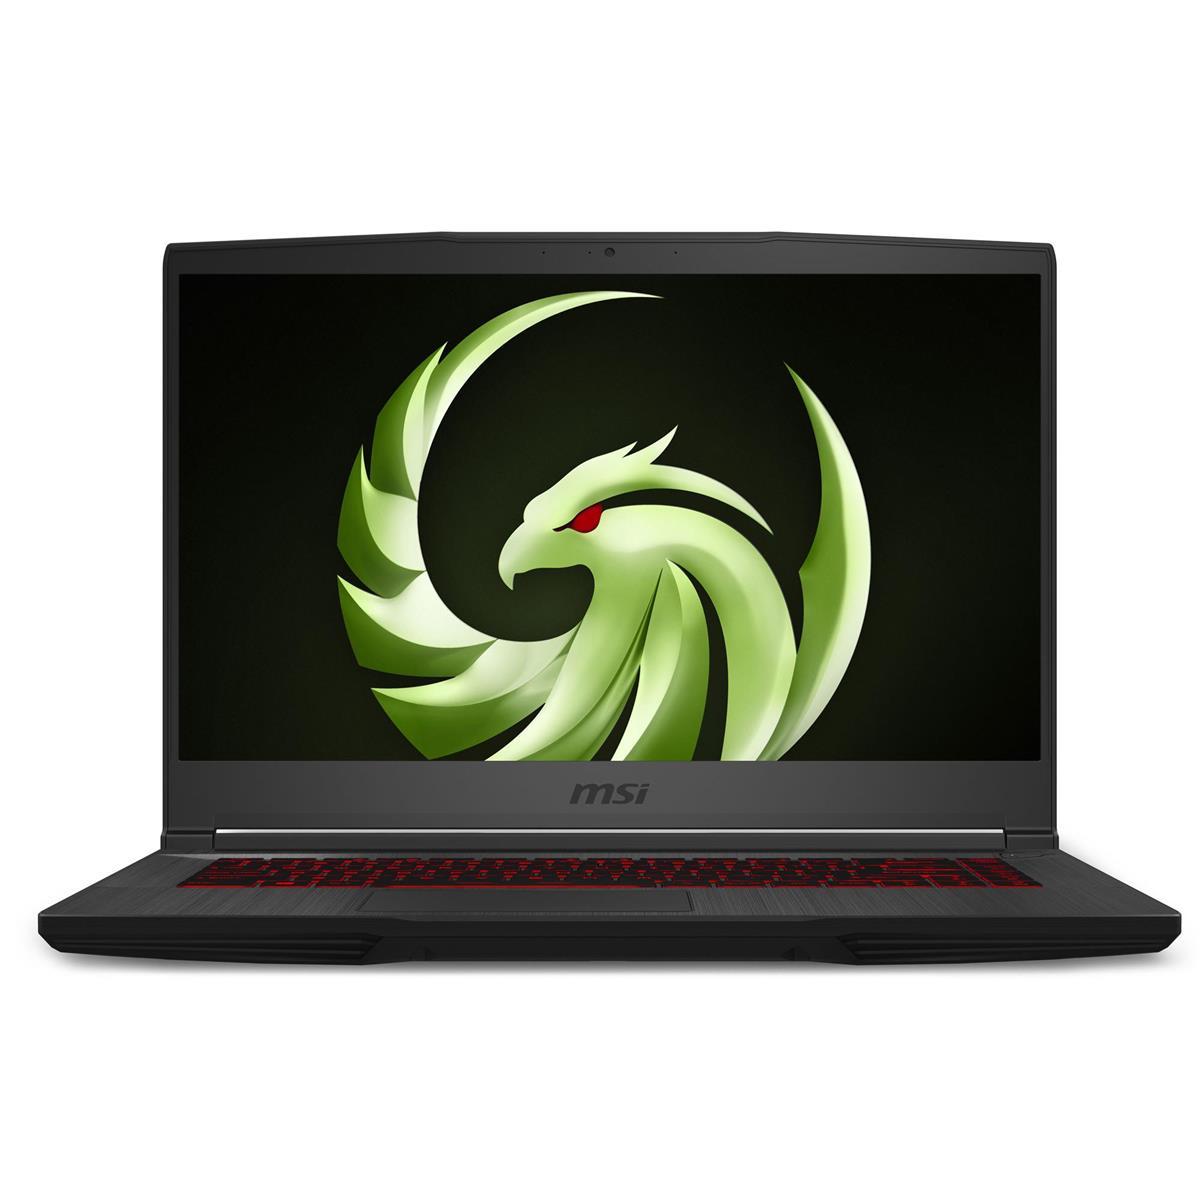 "MSI Bravo 15 A4DDR-023 15.6"" Full HD 120Hz Gaming Notebook Computer, AMD Ryzen 7-4800H 2.9GHz, 16GB RAM, 512GB SSD, Radeon RX5500M 4GB, Windows 10 Home"